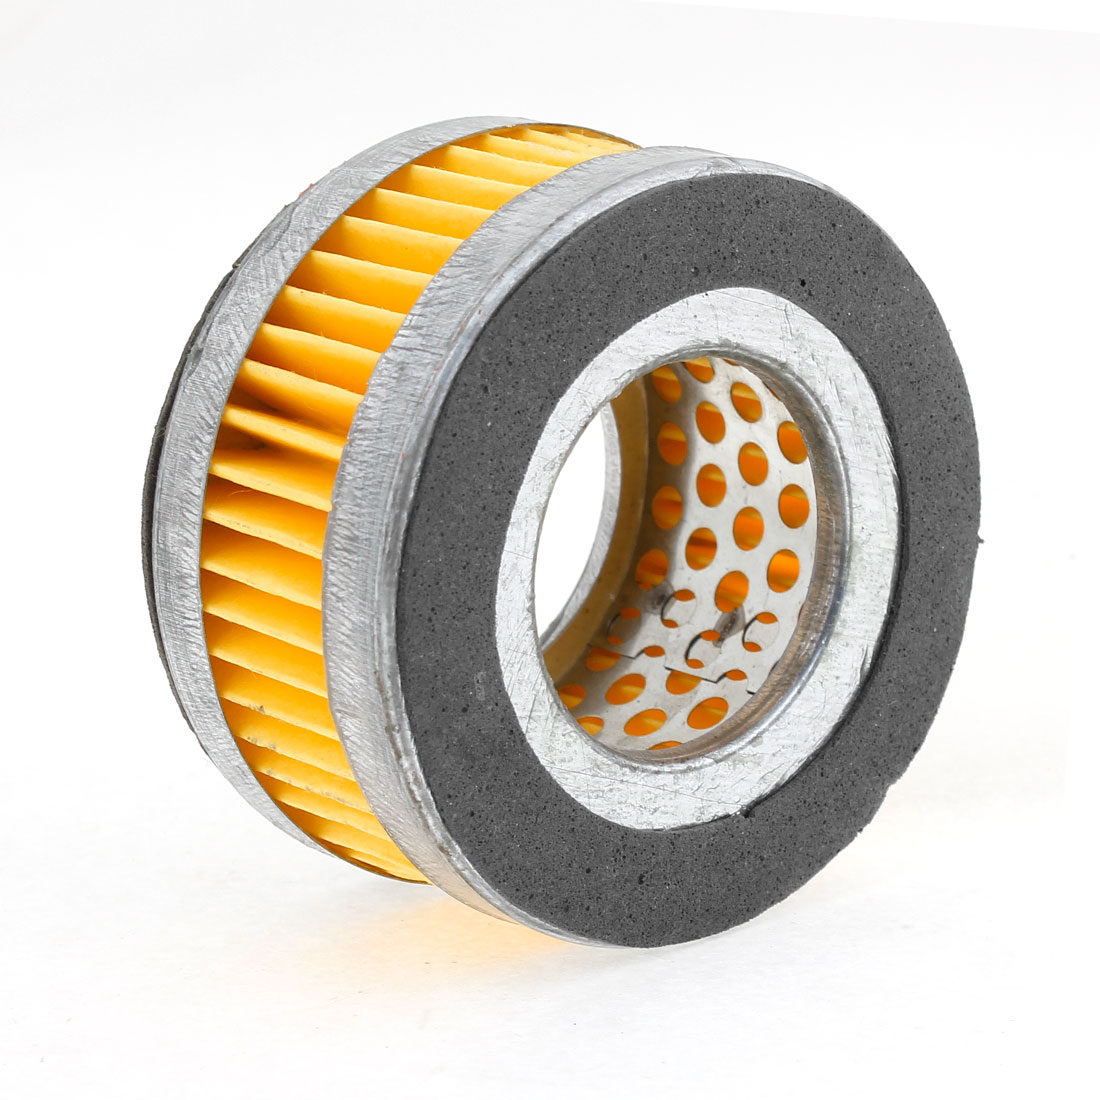 Car Auto Air Compressor Cylindrical Muffler Filter 35mm x 69mm x 35mm